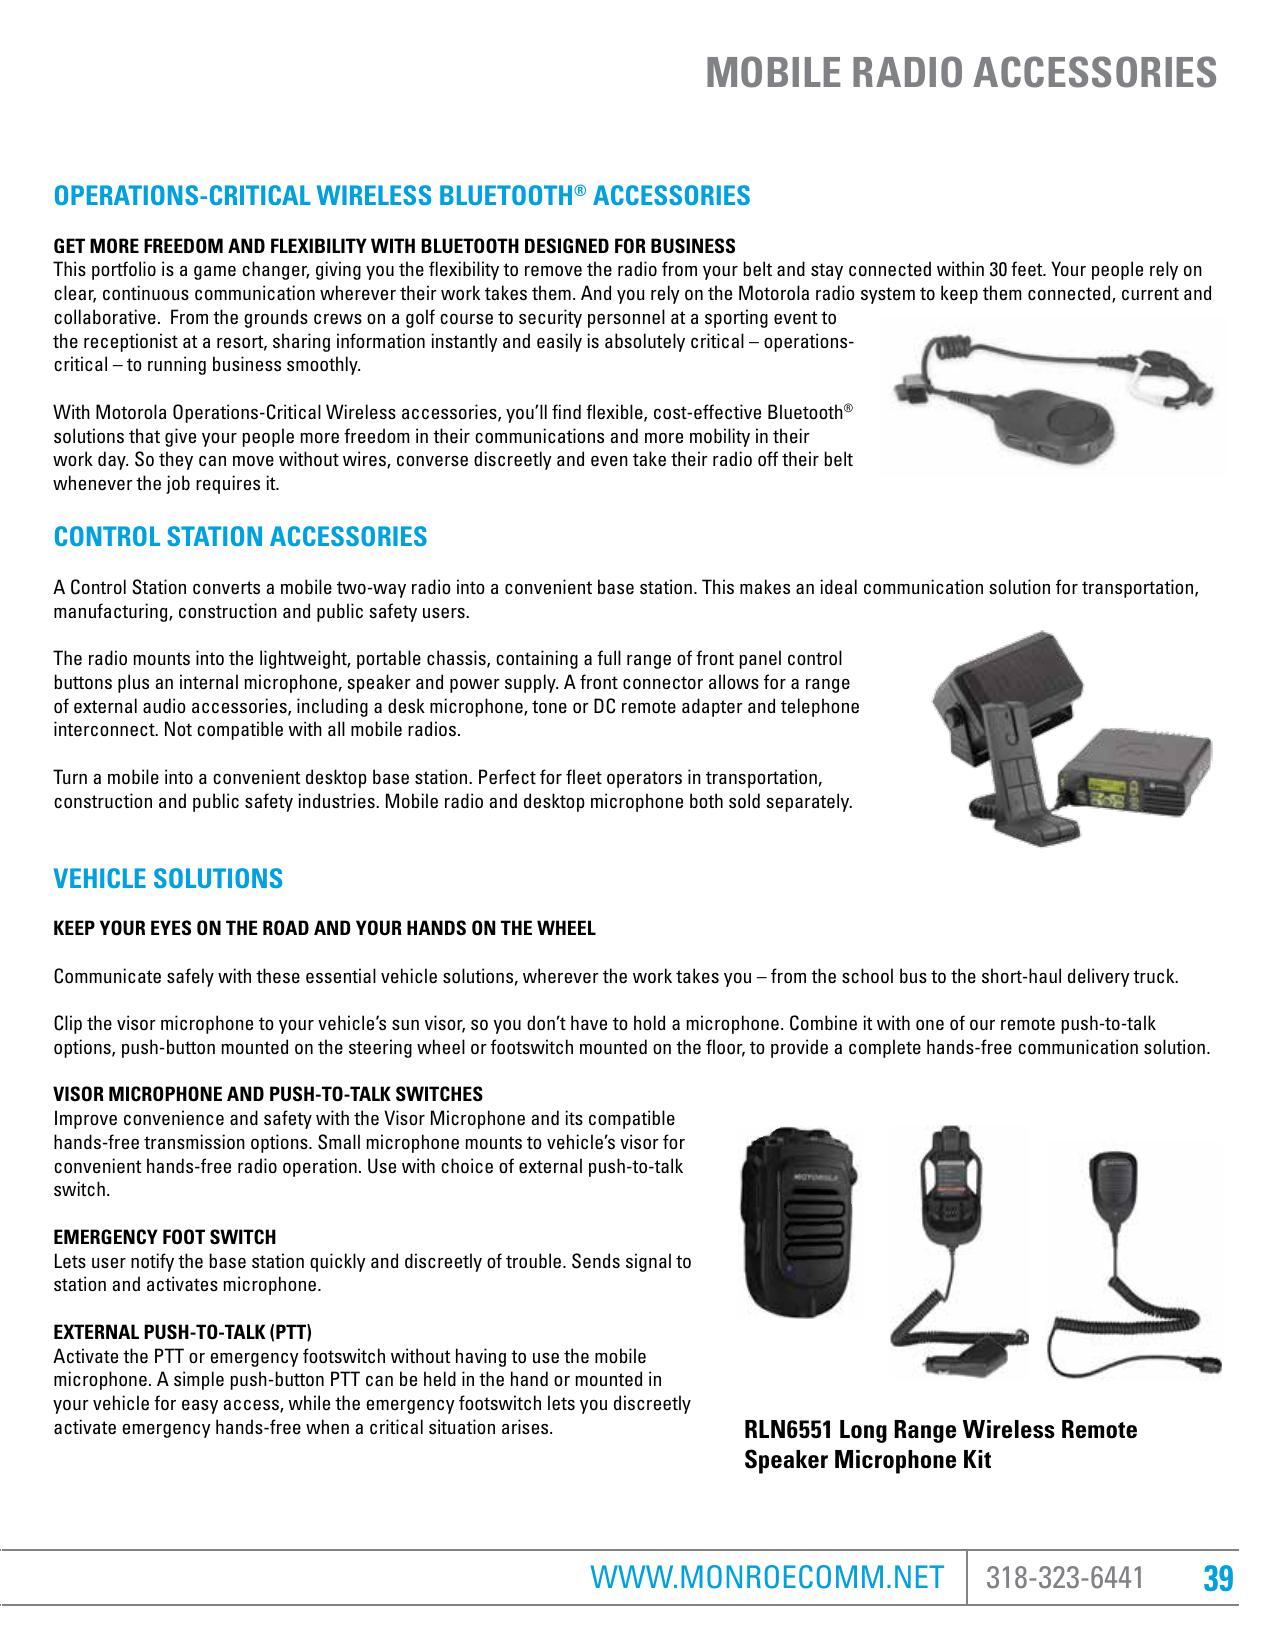 PORTABLE RADIO ACCESSORIES | manualzz com